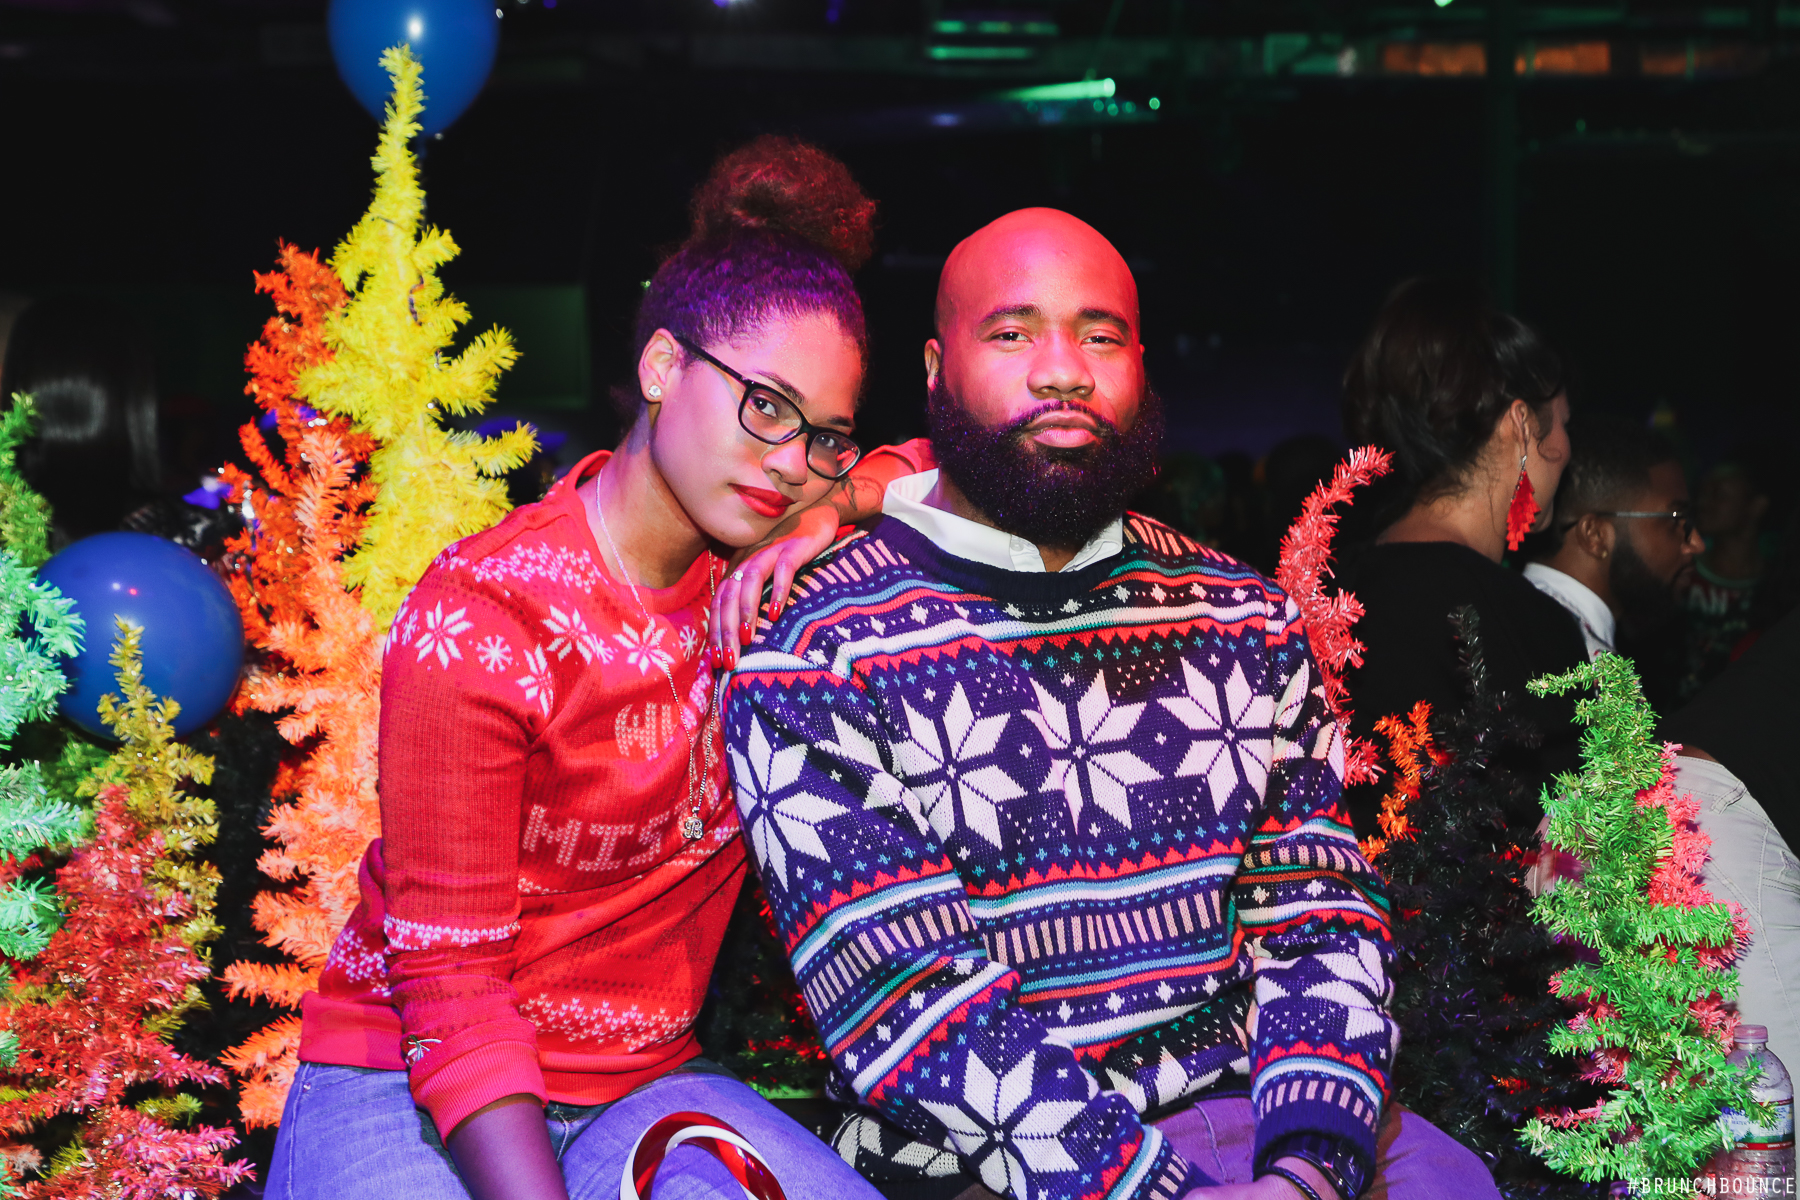 Brunch Bounce Ugly Sweater 2018-141.jpg